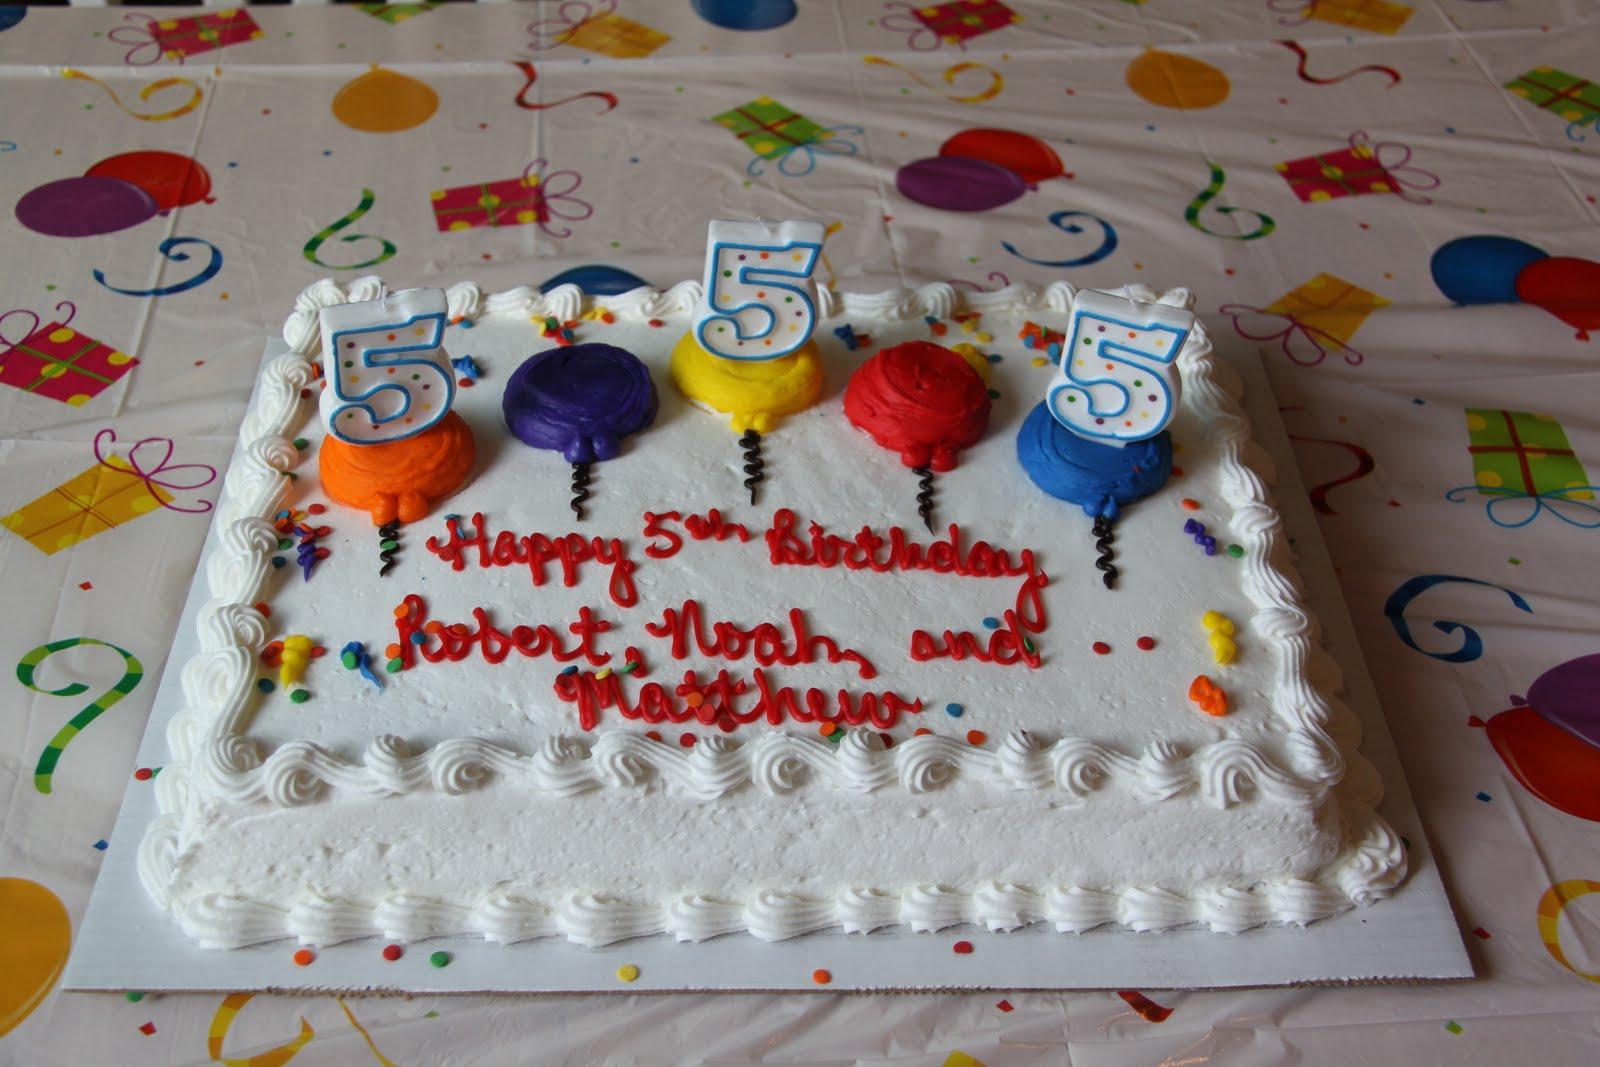 Strange 11 Costco Birthday Cakes Order Photo Costco Cake Designs Order Funny Birthday Cards Online Elaedamsfinfo